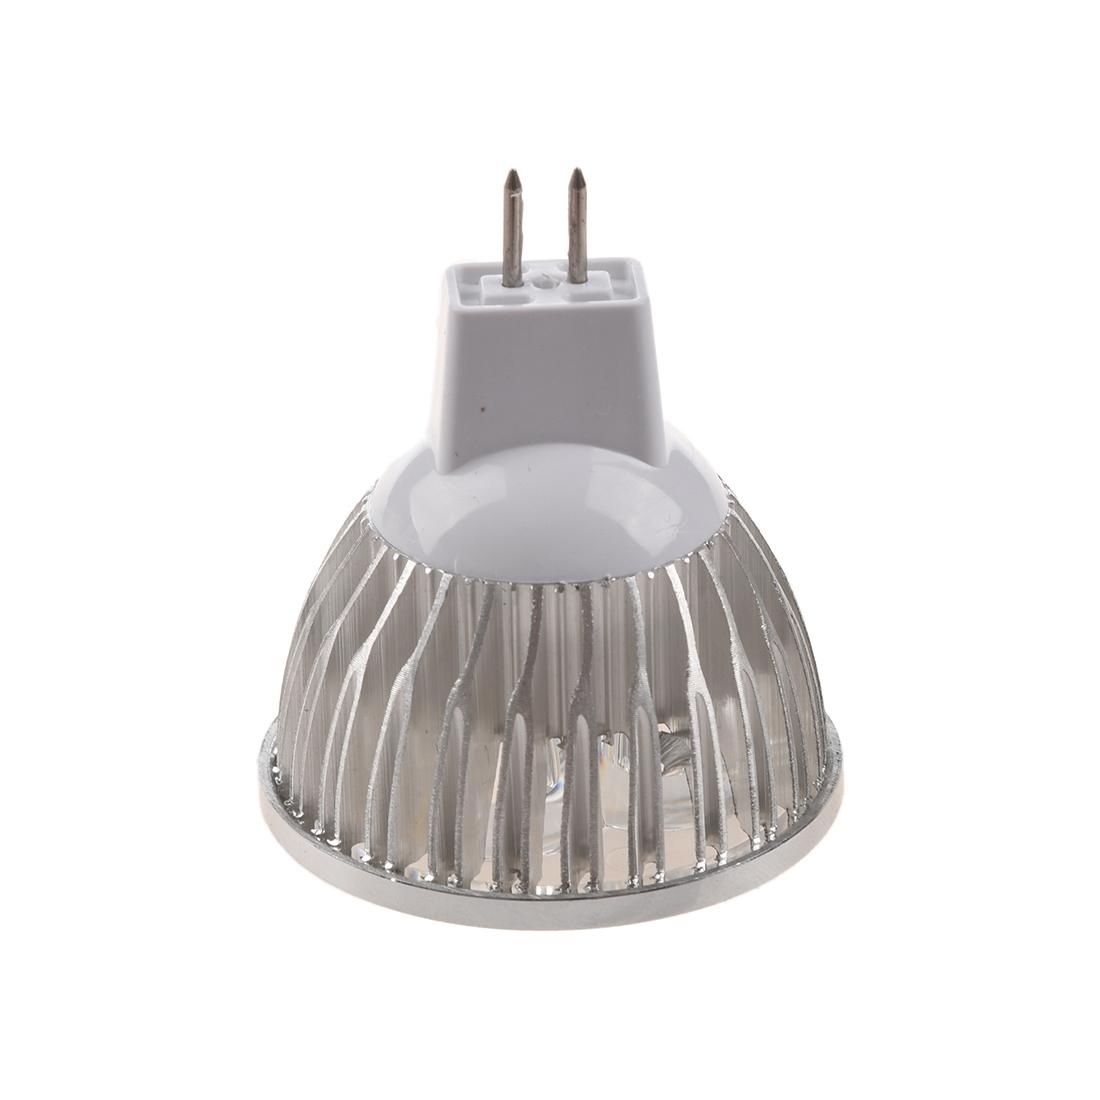 4 1w gu5 3 mr16 12v warm white led light lamp bulb spotlight ad ebay. Black Bedroom Furniture Sets. Home Design Ideas